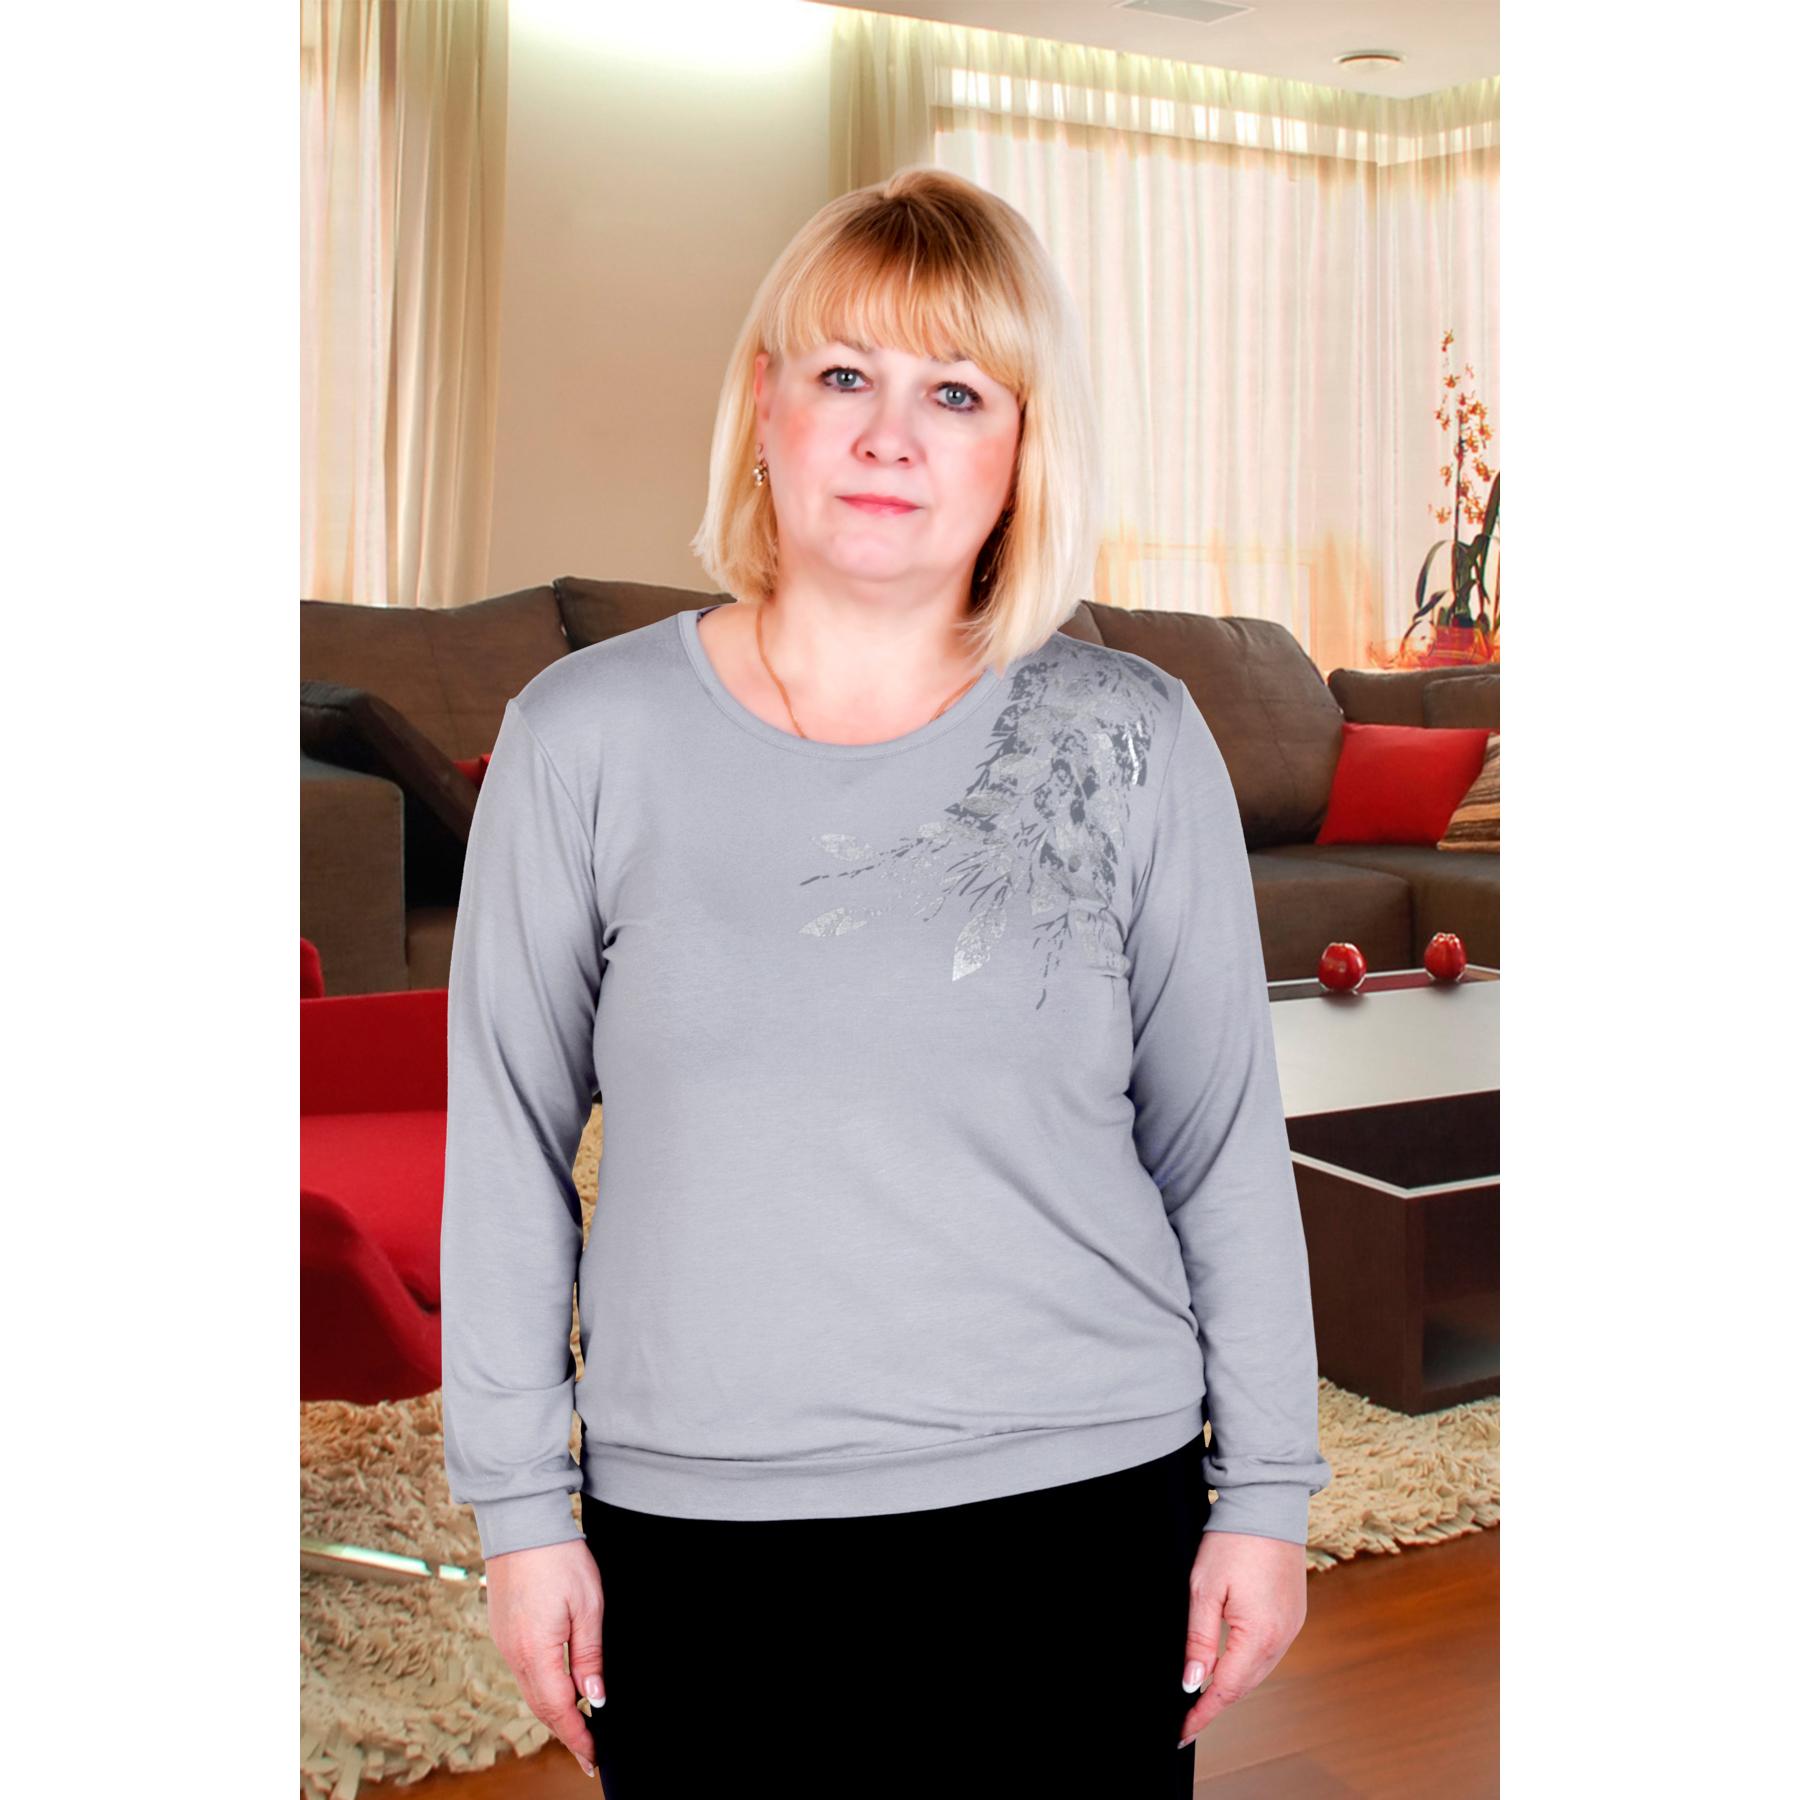 Женская блуза Лира Серый, размер 56Блузы<br>Обхват груди:112 см<br>Обхват талии:92 см<br>Обхват бедер:120 см<br>Рост:167 см<br><br>Тип: Жен. блуза<br>Размер: 56<br>Материал: Вискоза